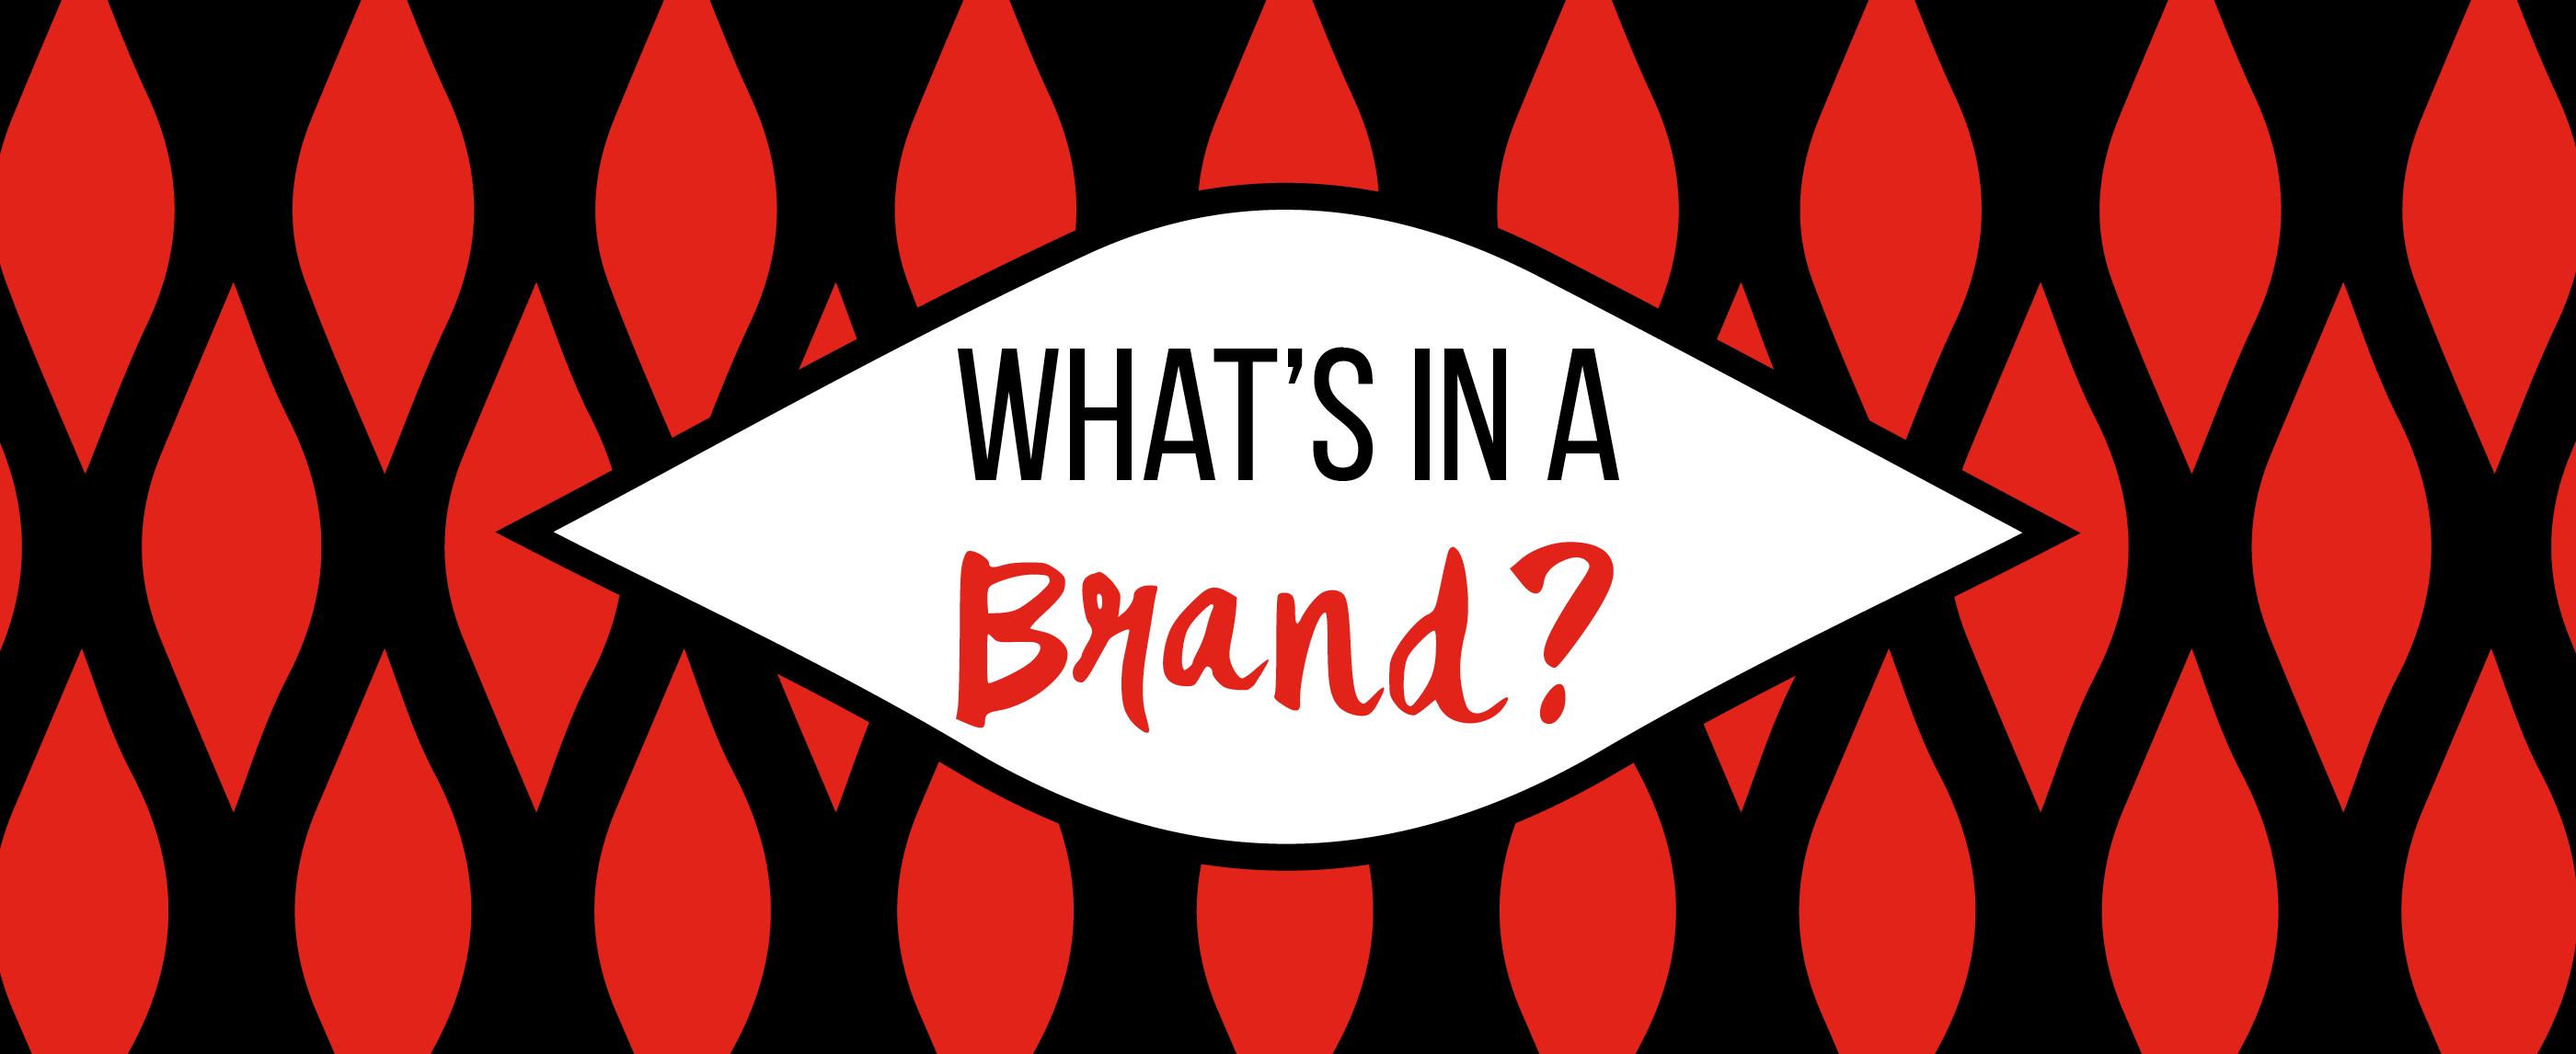 branding-blog-featured